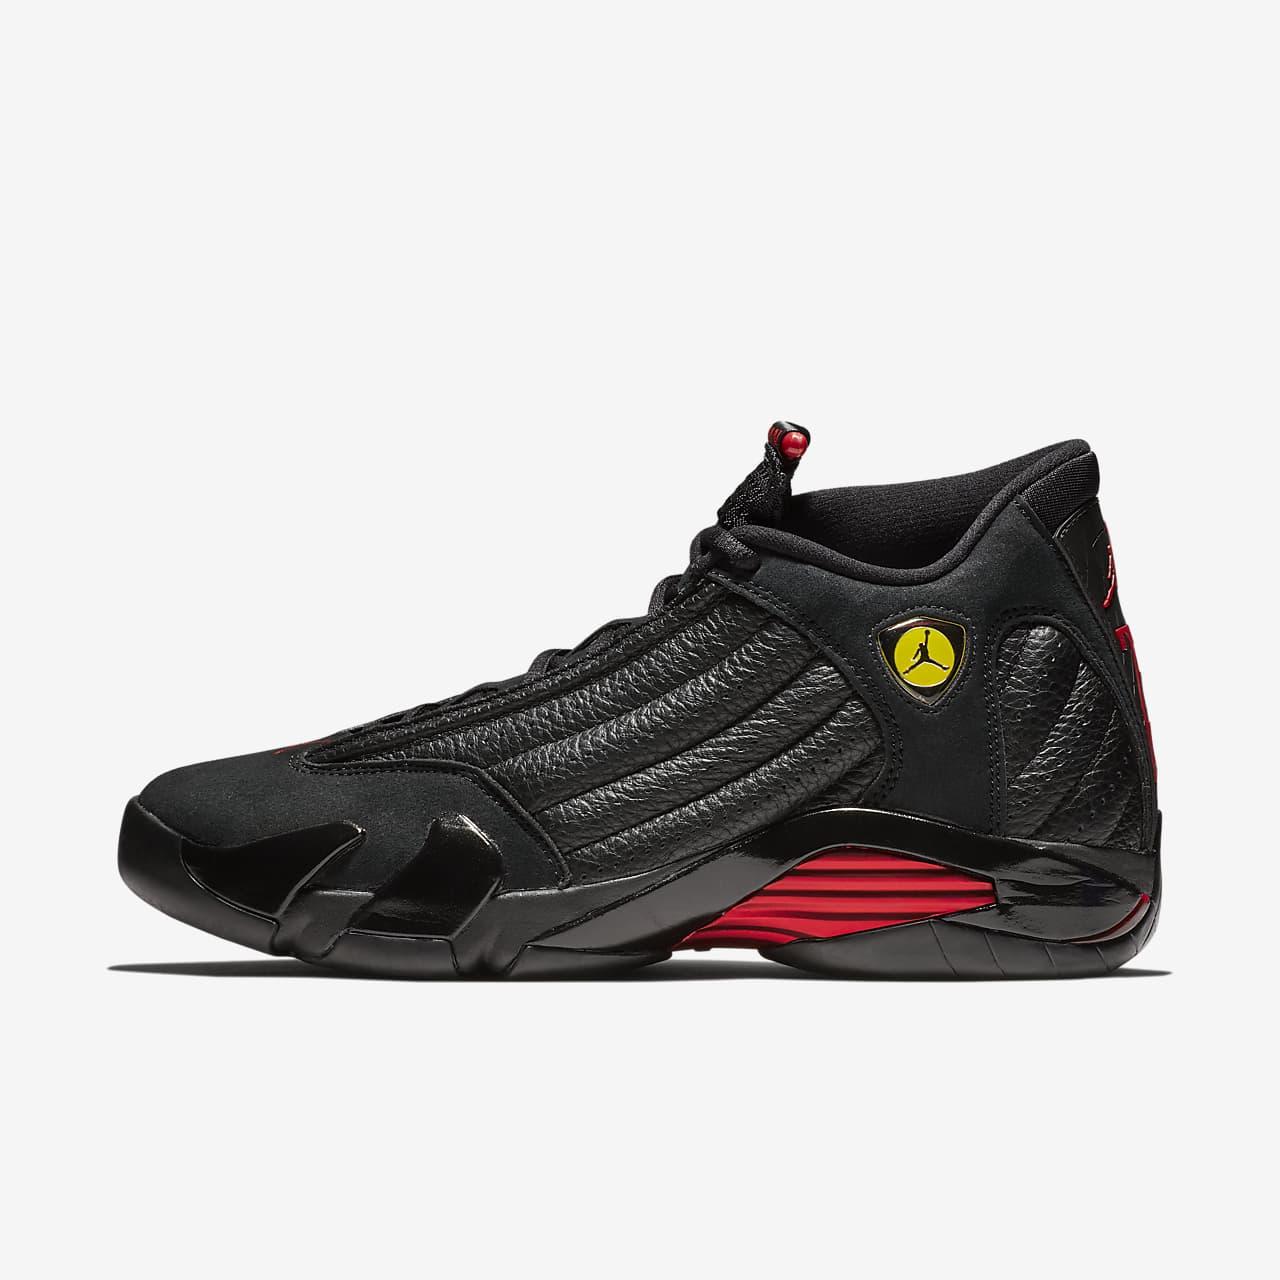 Air Jordan 14 Retro Shoe